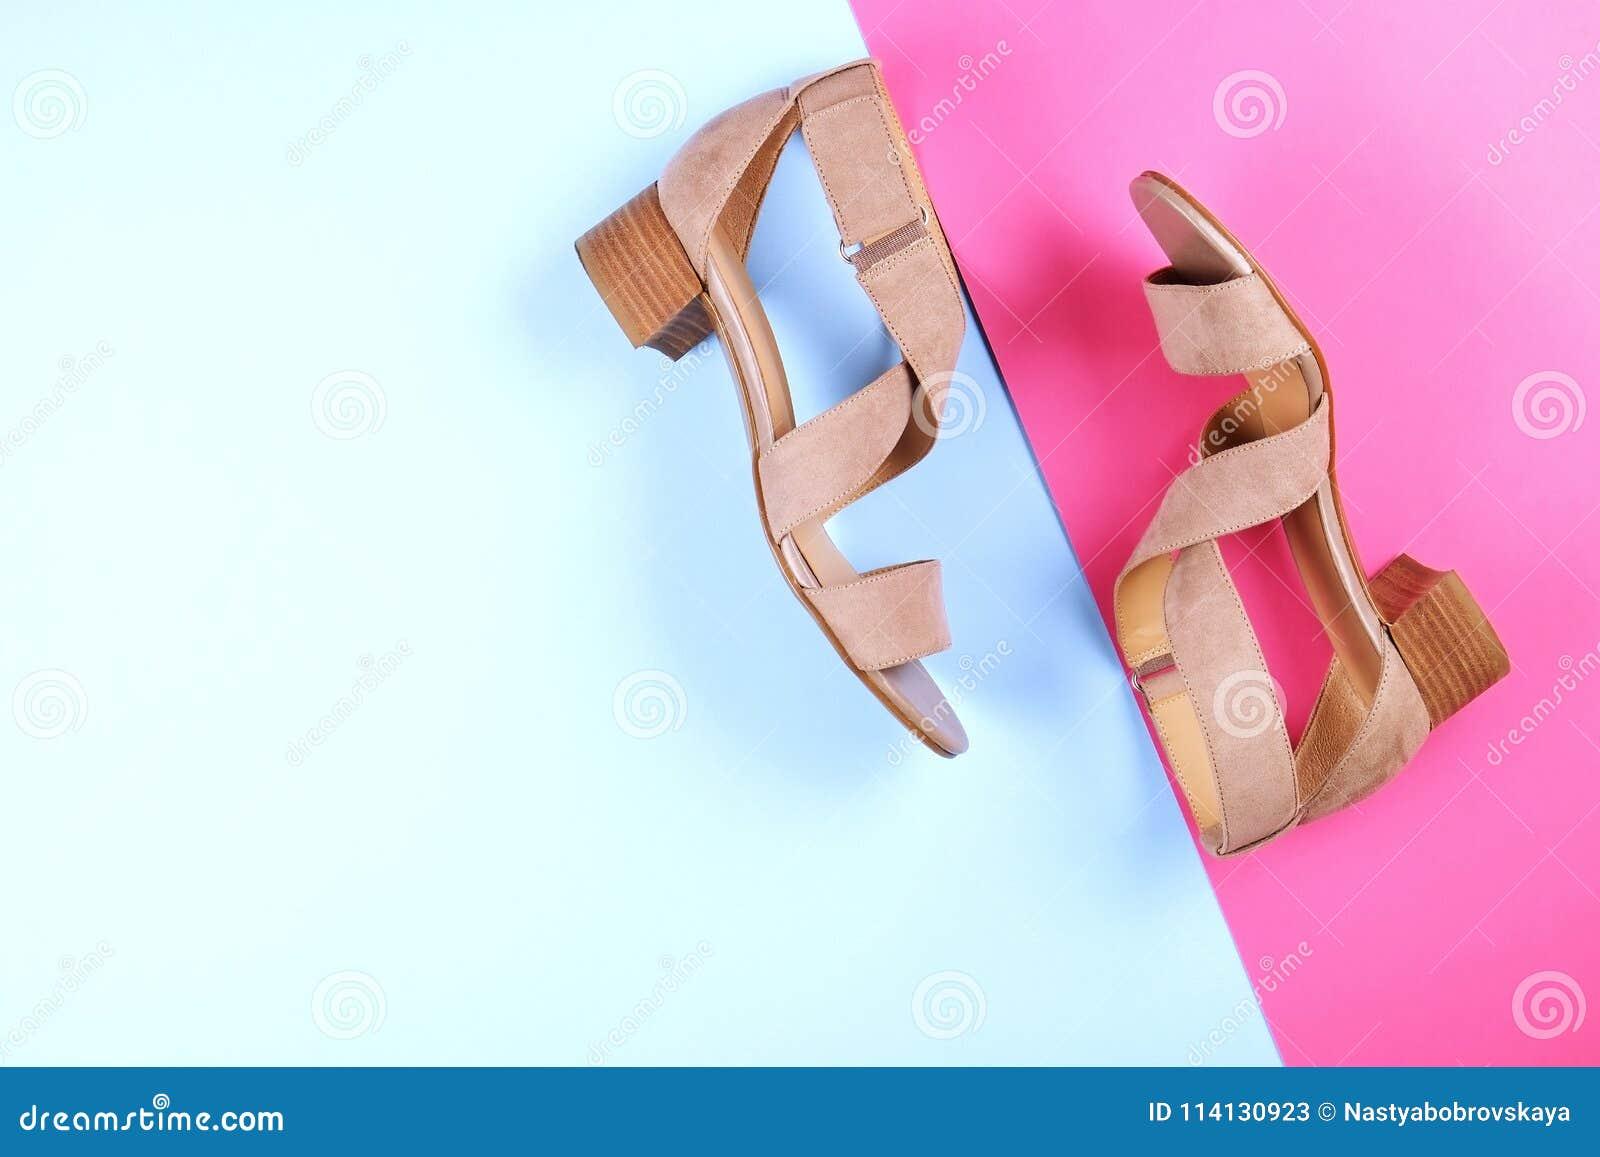 03320c31c4153 Top View Of Fashionable Feminine Medium Heeled Women`s Leather Shoes ...